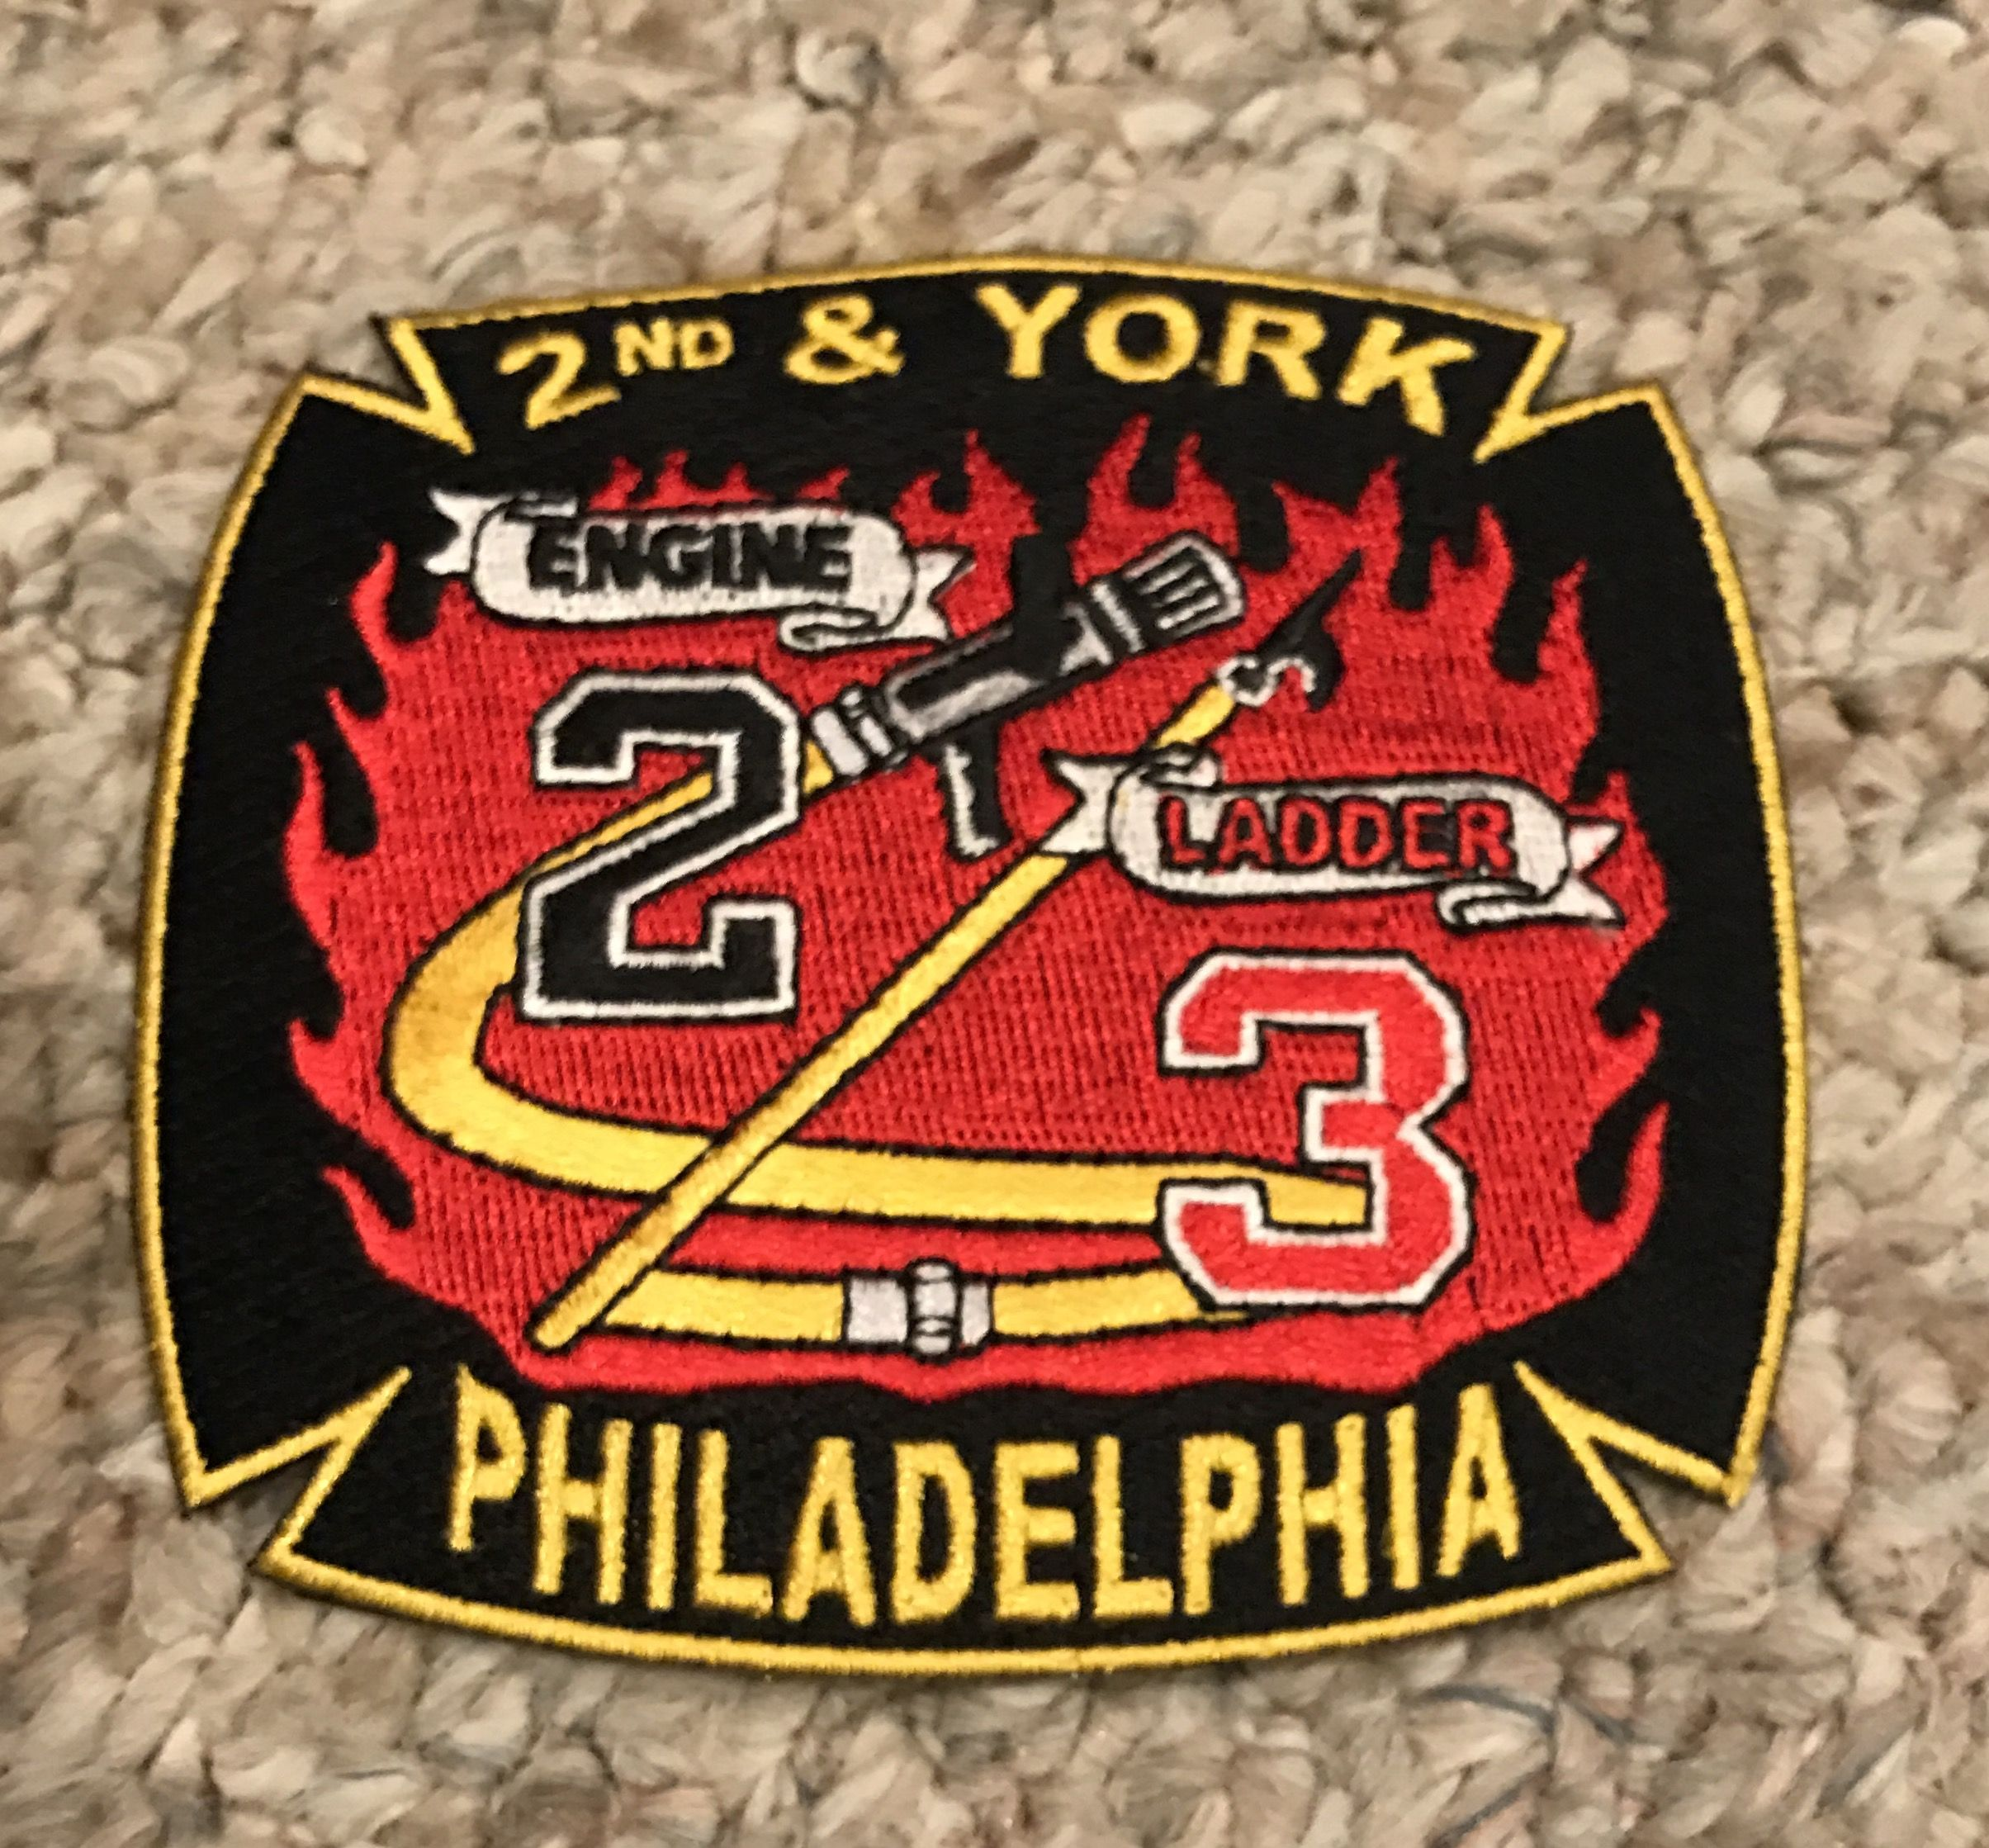 Engine 2 Ladder 3 Firefighter, Vehicle logos, Fire dept